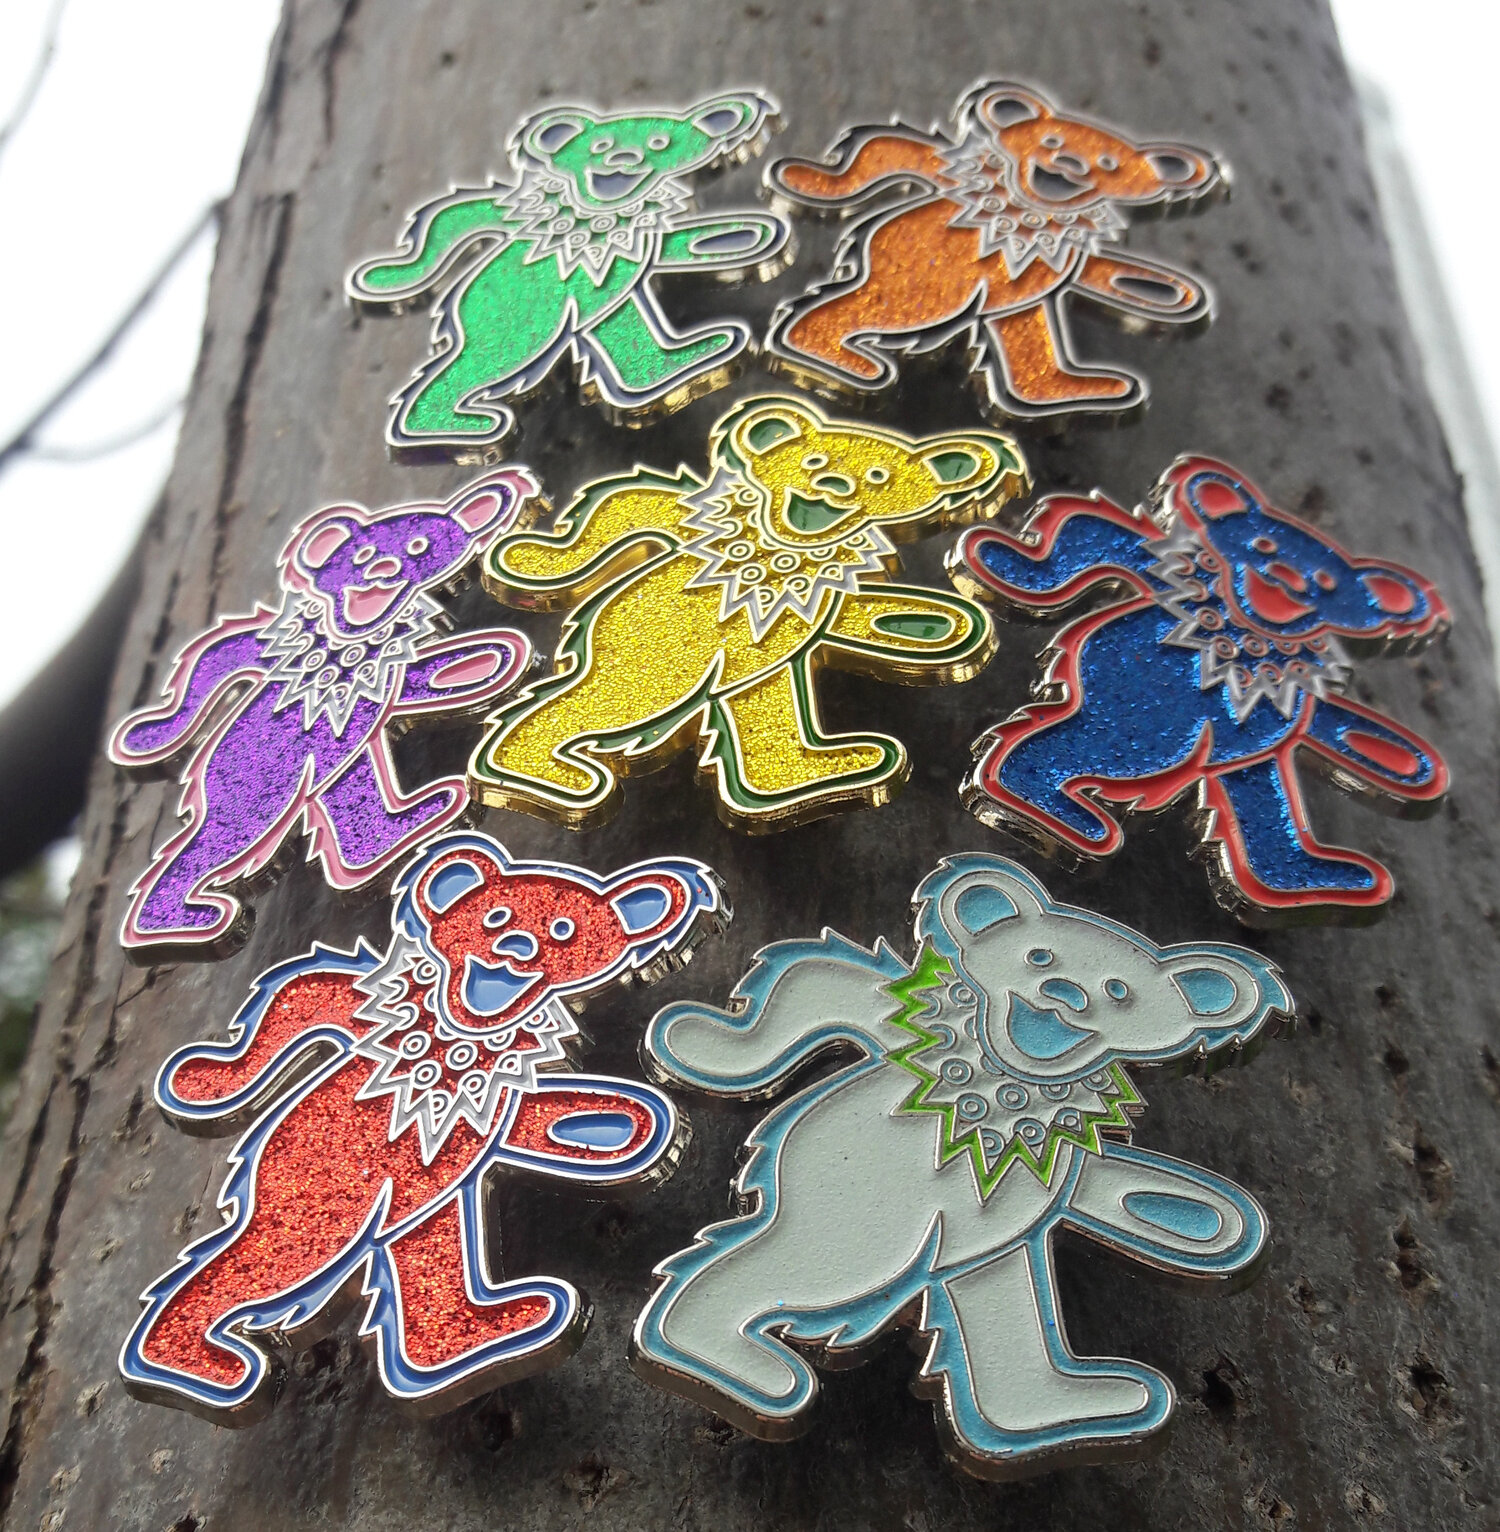 Phancy Bear PHiSH Sticker Grateful Dead Sticker FREE SHIPPING!!!